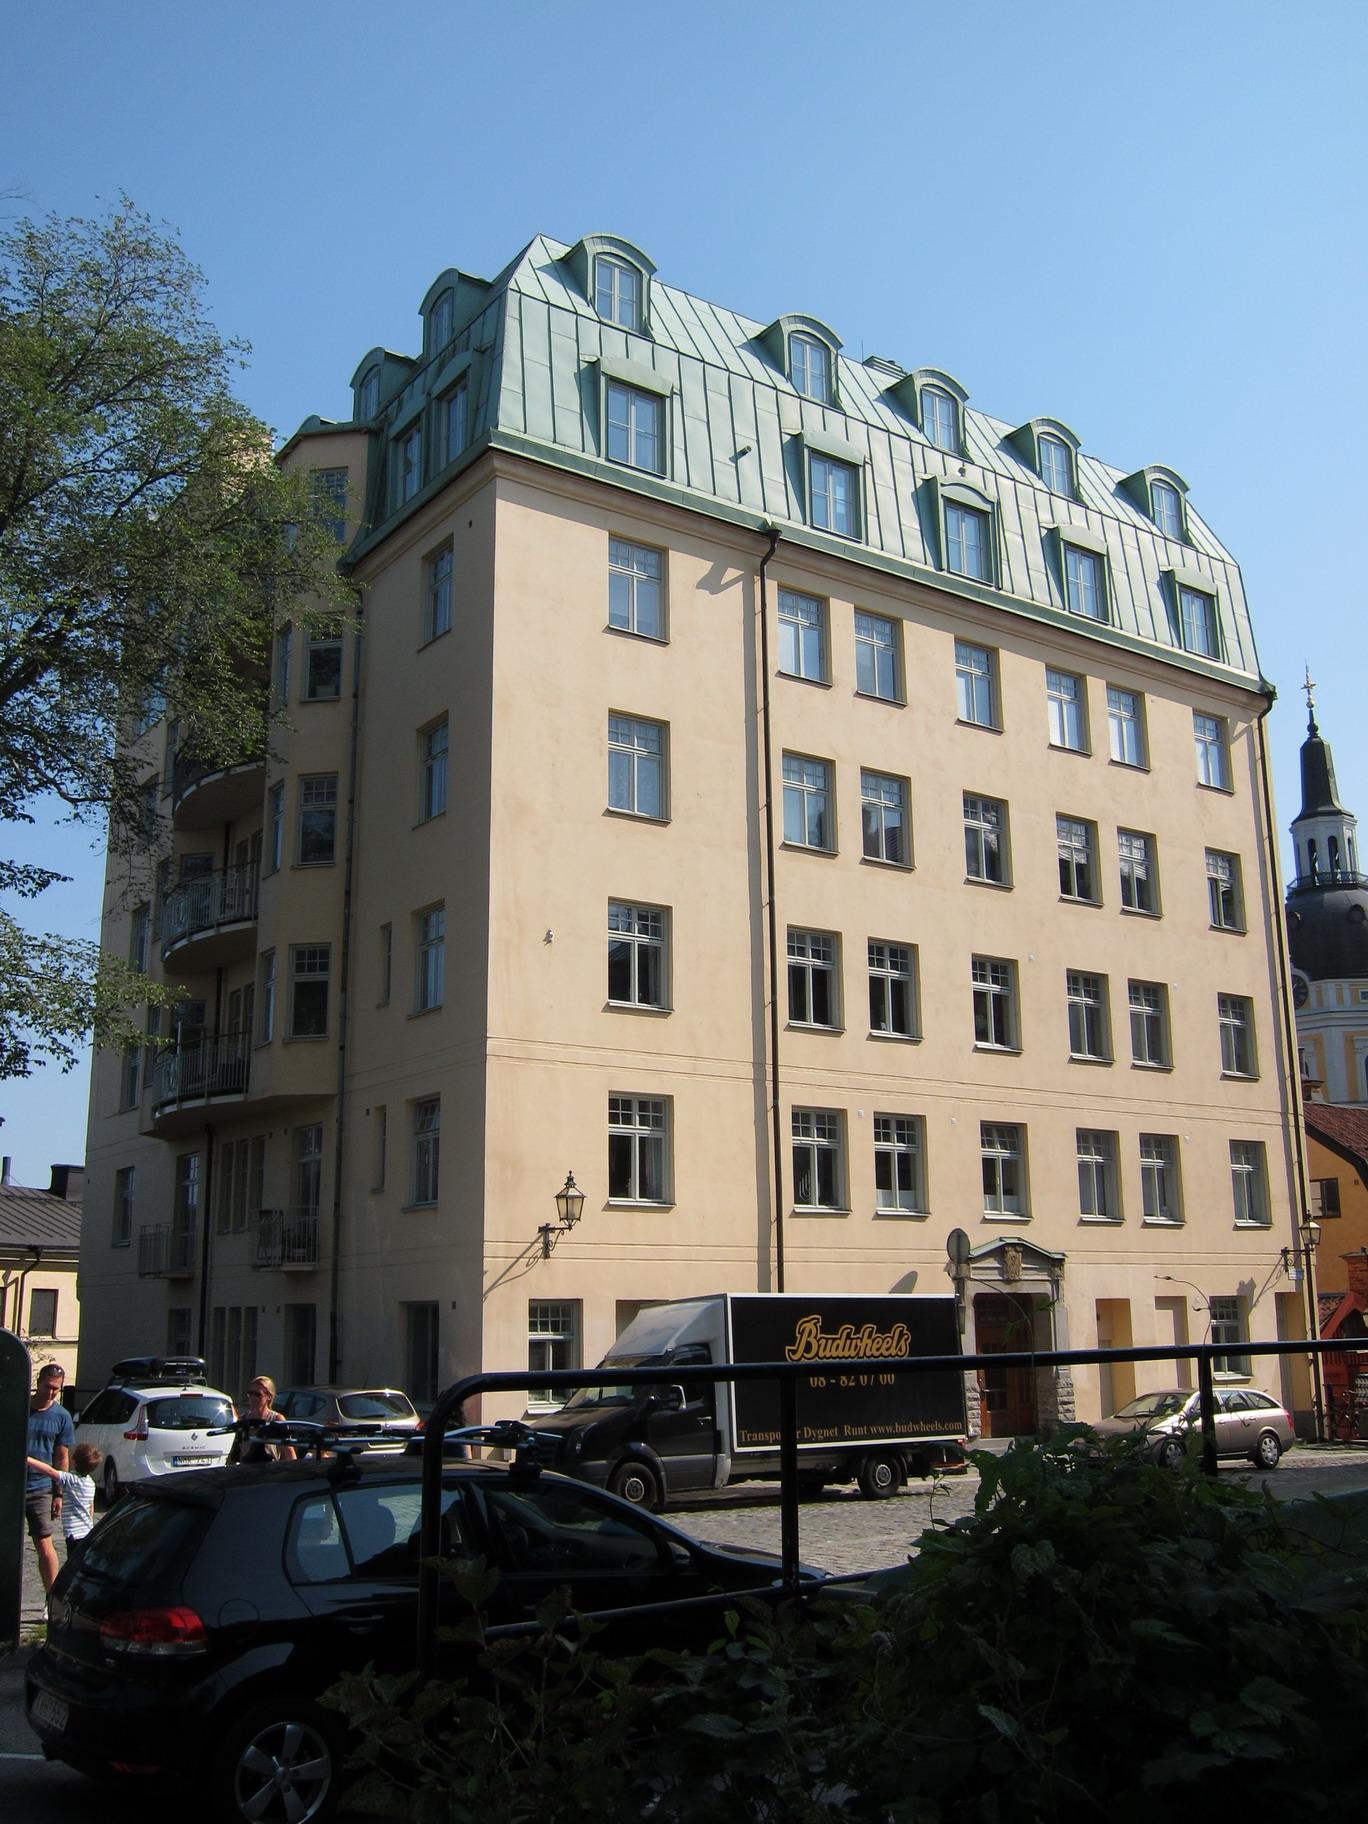 Lisbeth Salander S New Apartment